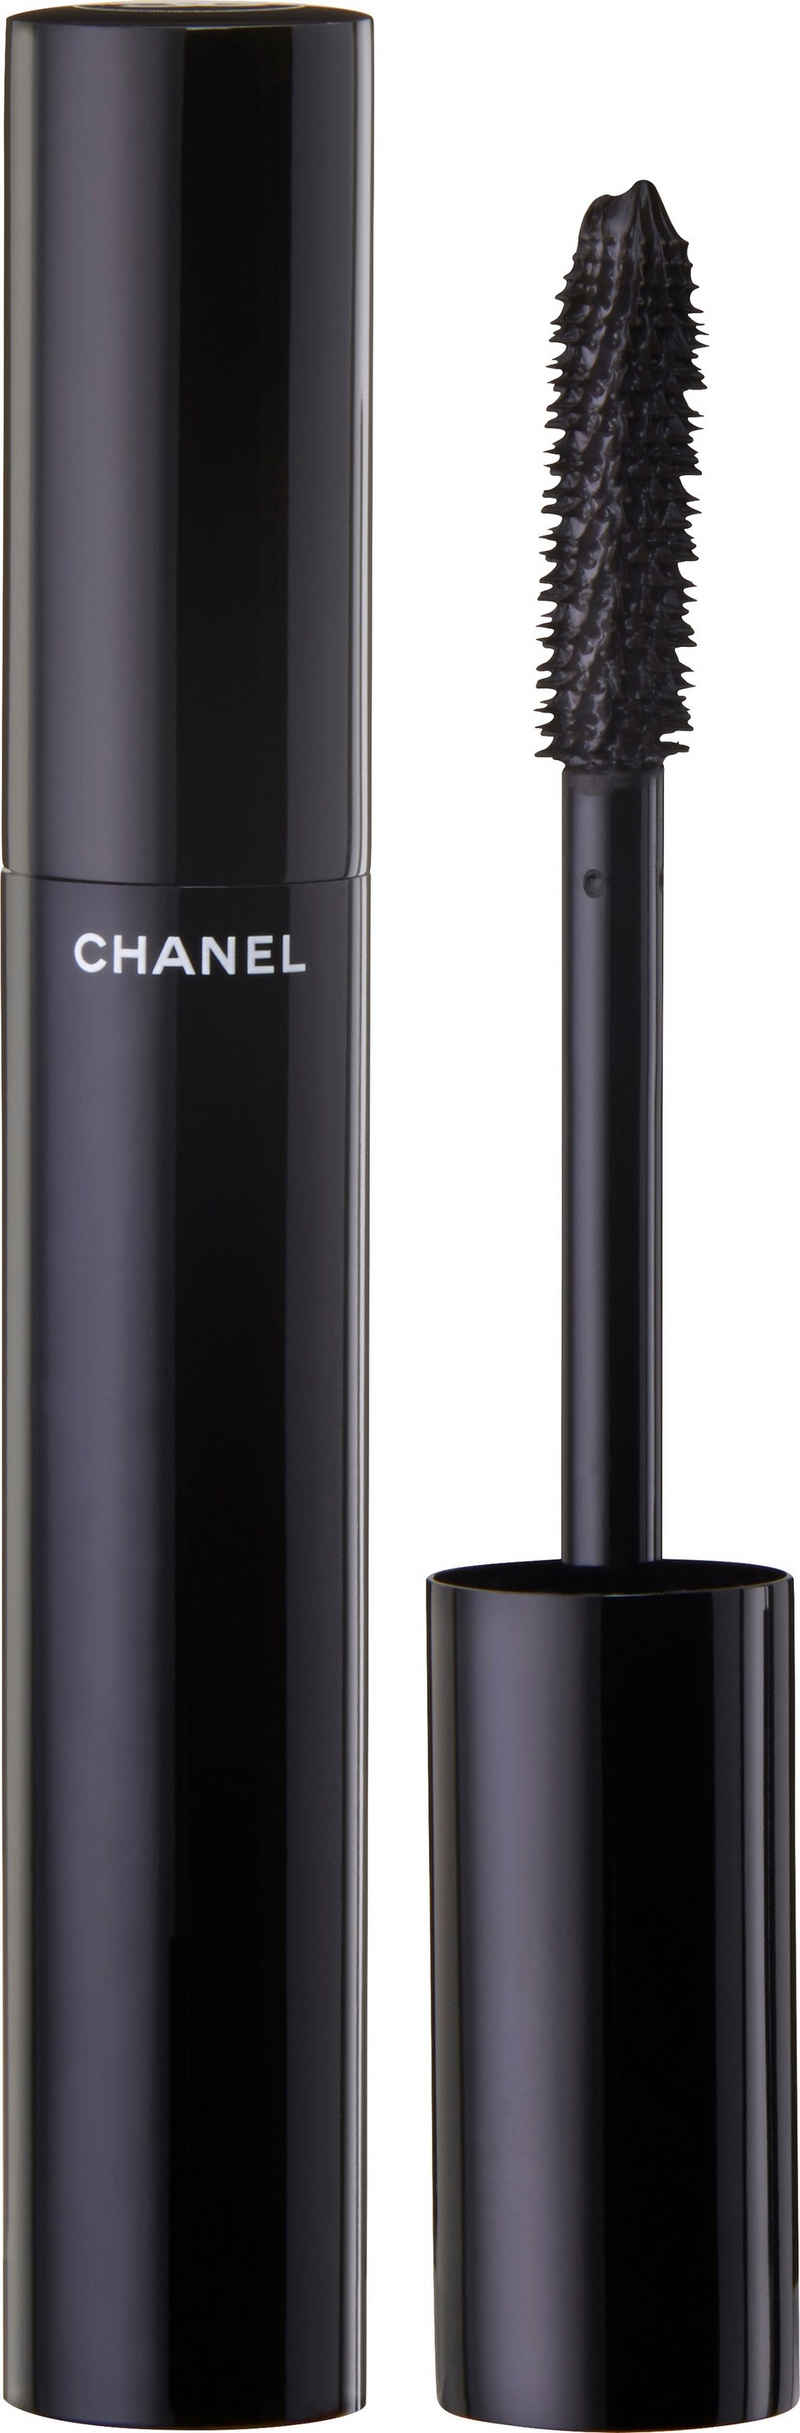 CHANEL Mascara »Le Volume de Chanel«, Innovative Bürste